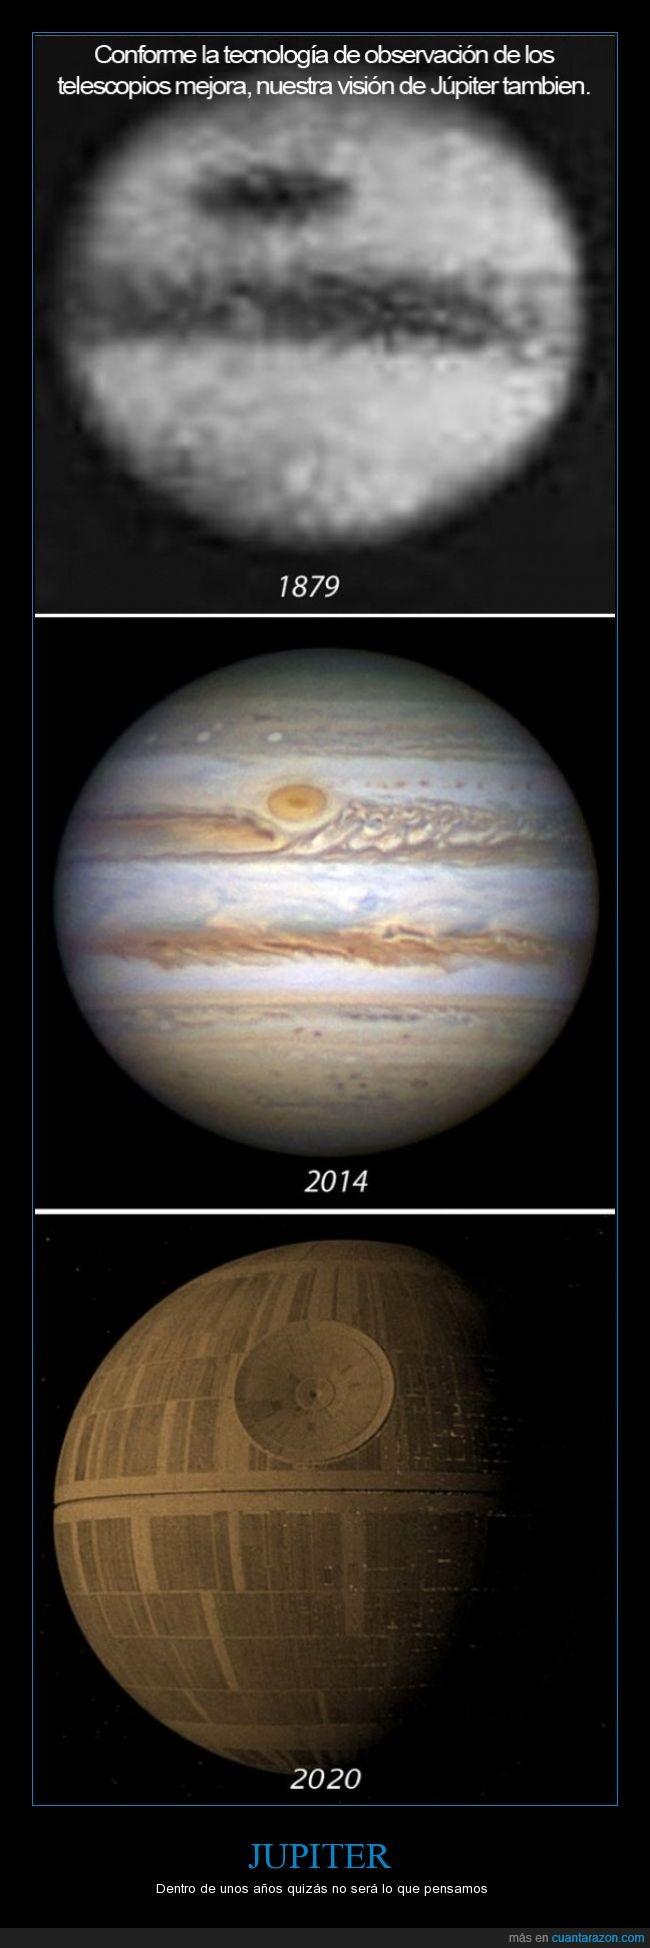 Espacio,Jupiter,La estrella de la muerte,Star Wars,Telescopio